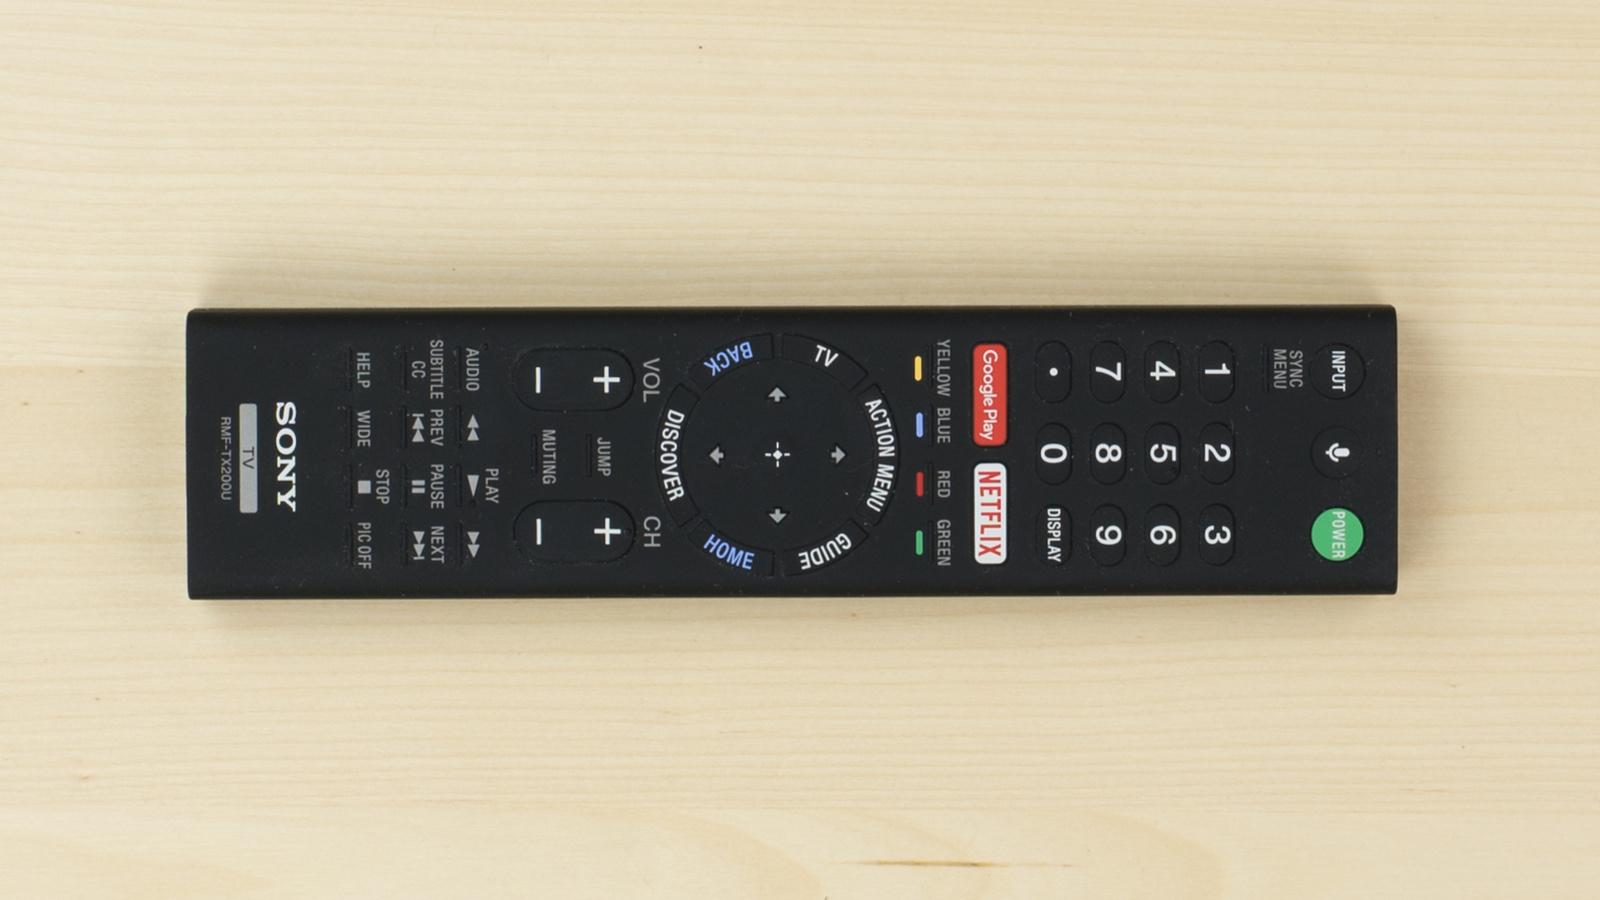 x850d-remote-large.jpg